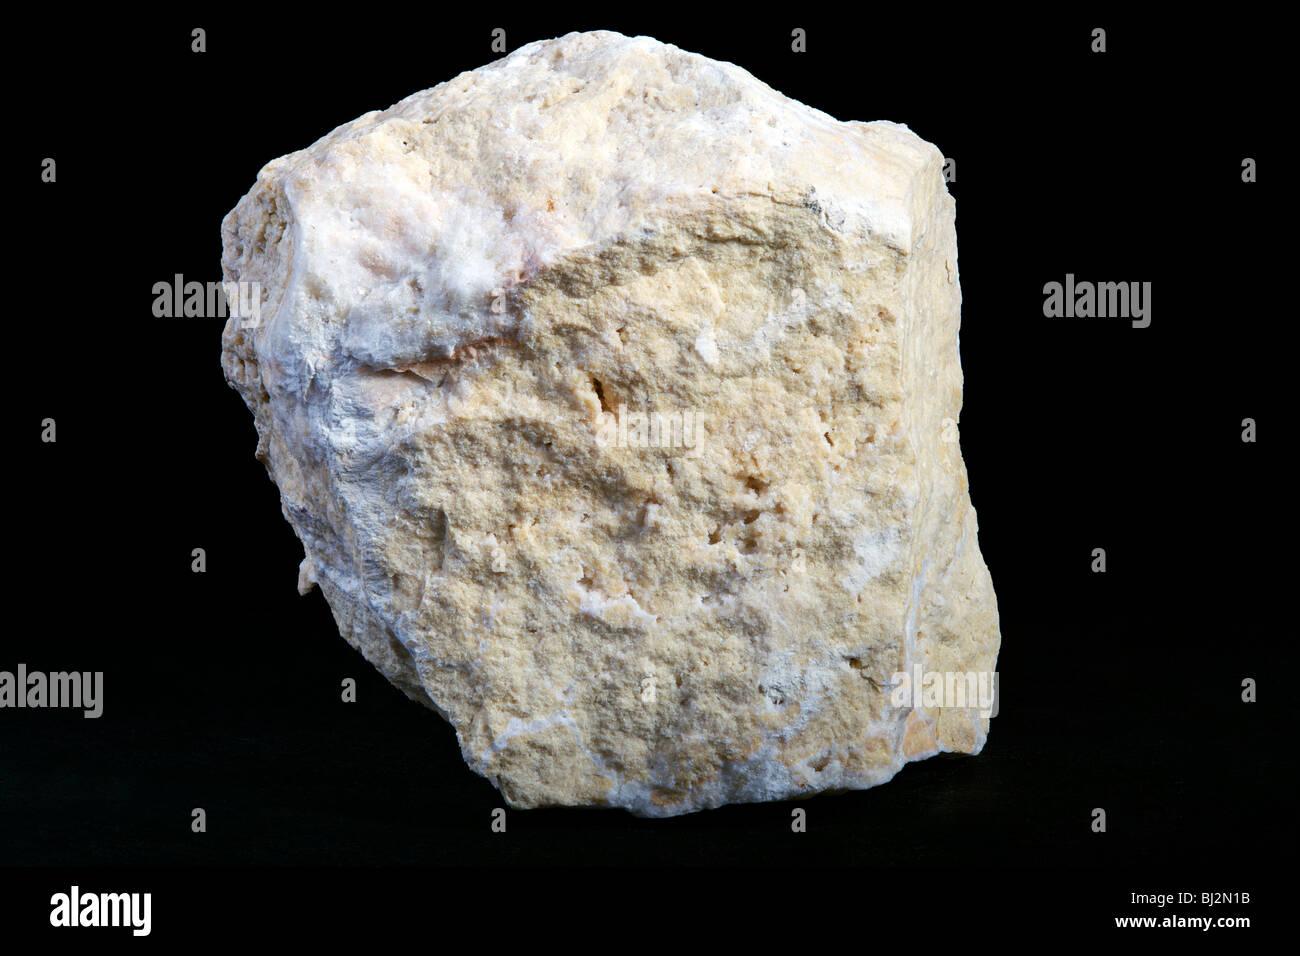 Travertine Sedimentary Rock Stock Photo Royalty Free